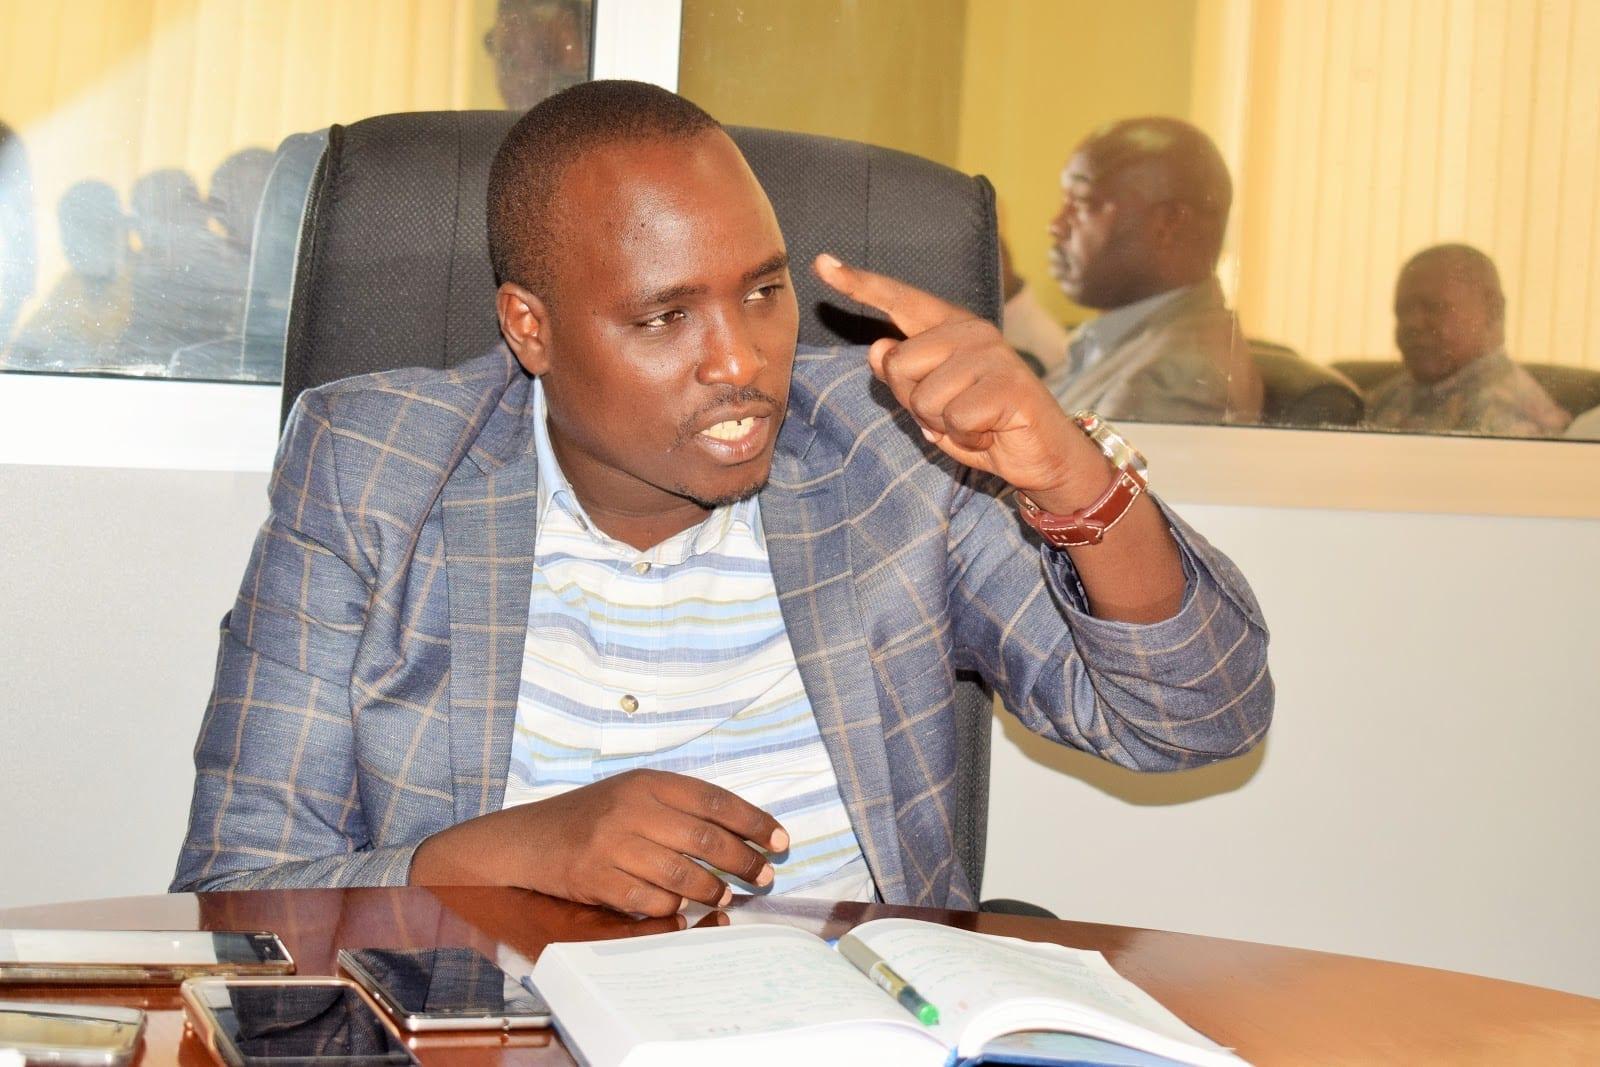 Biteko halts mining operations at Epanko